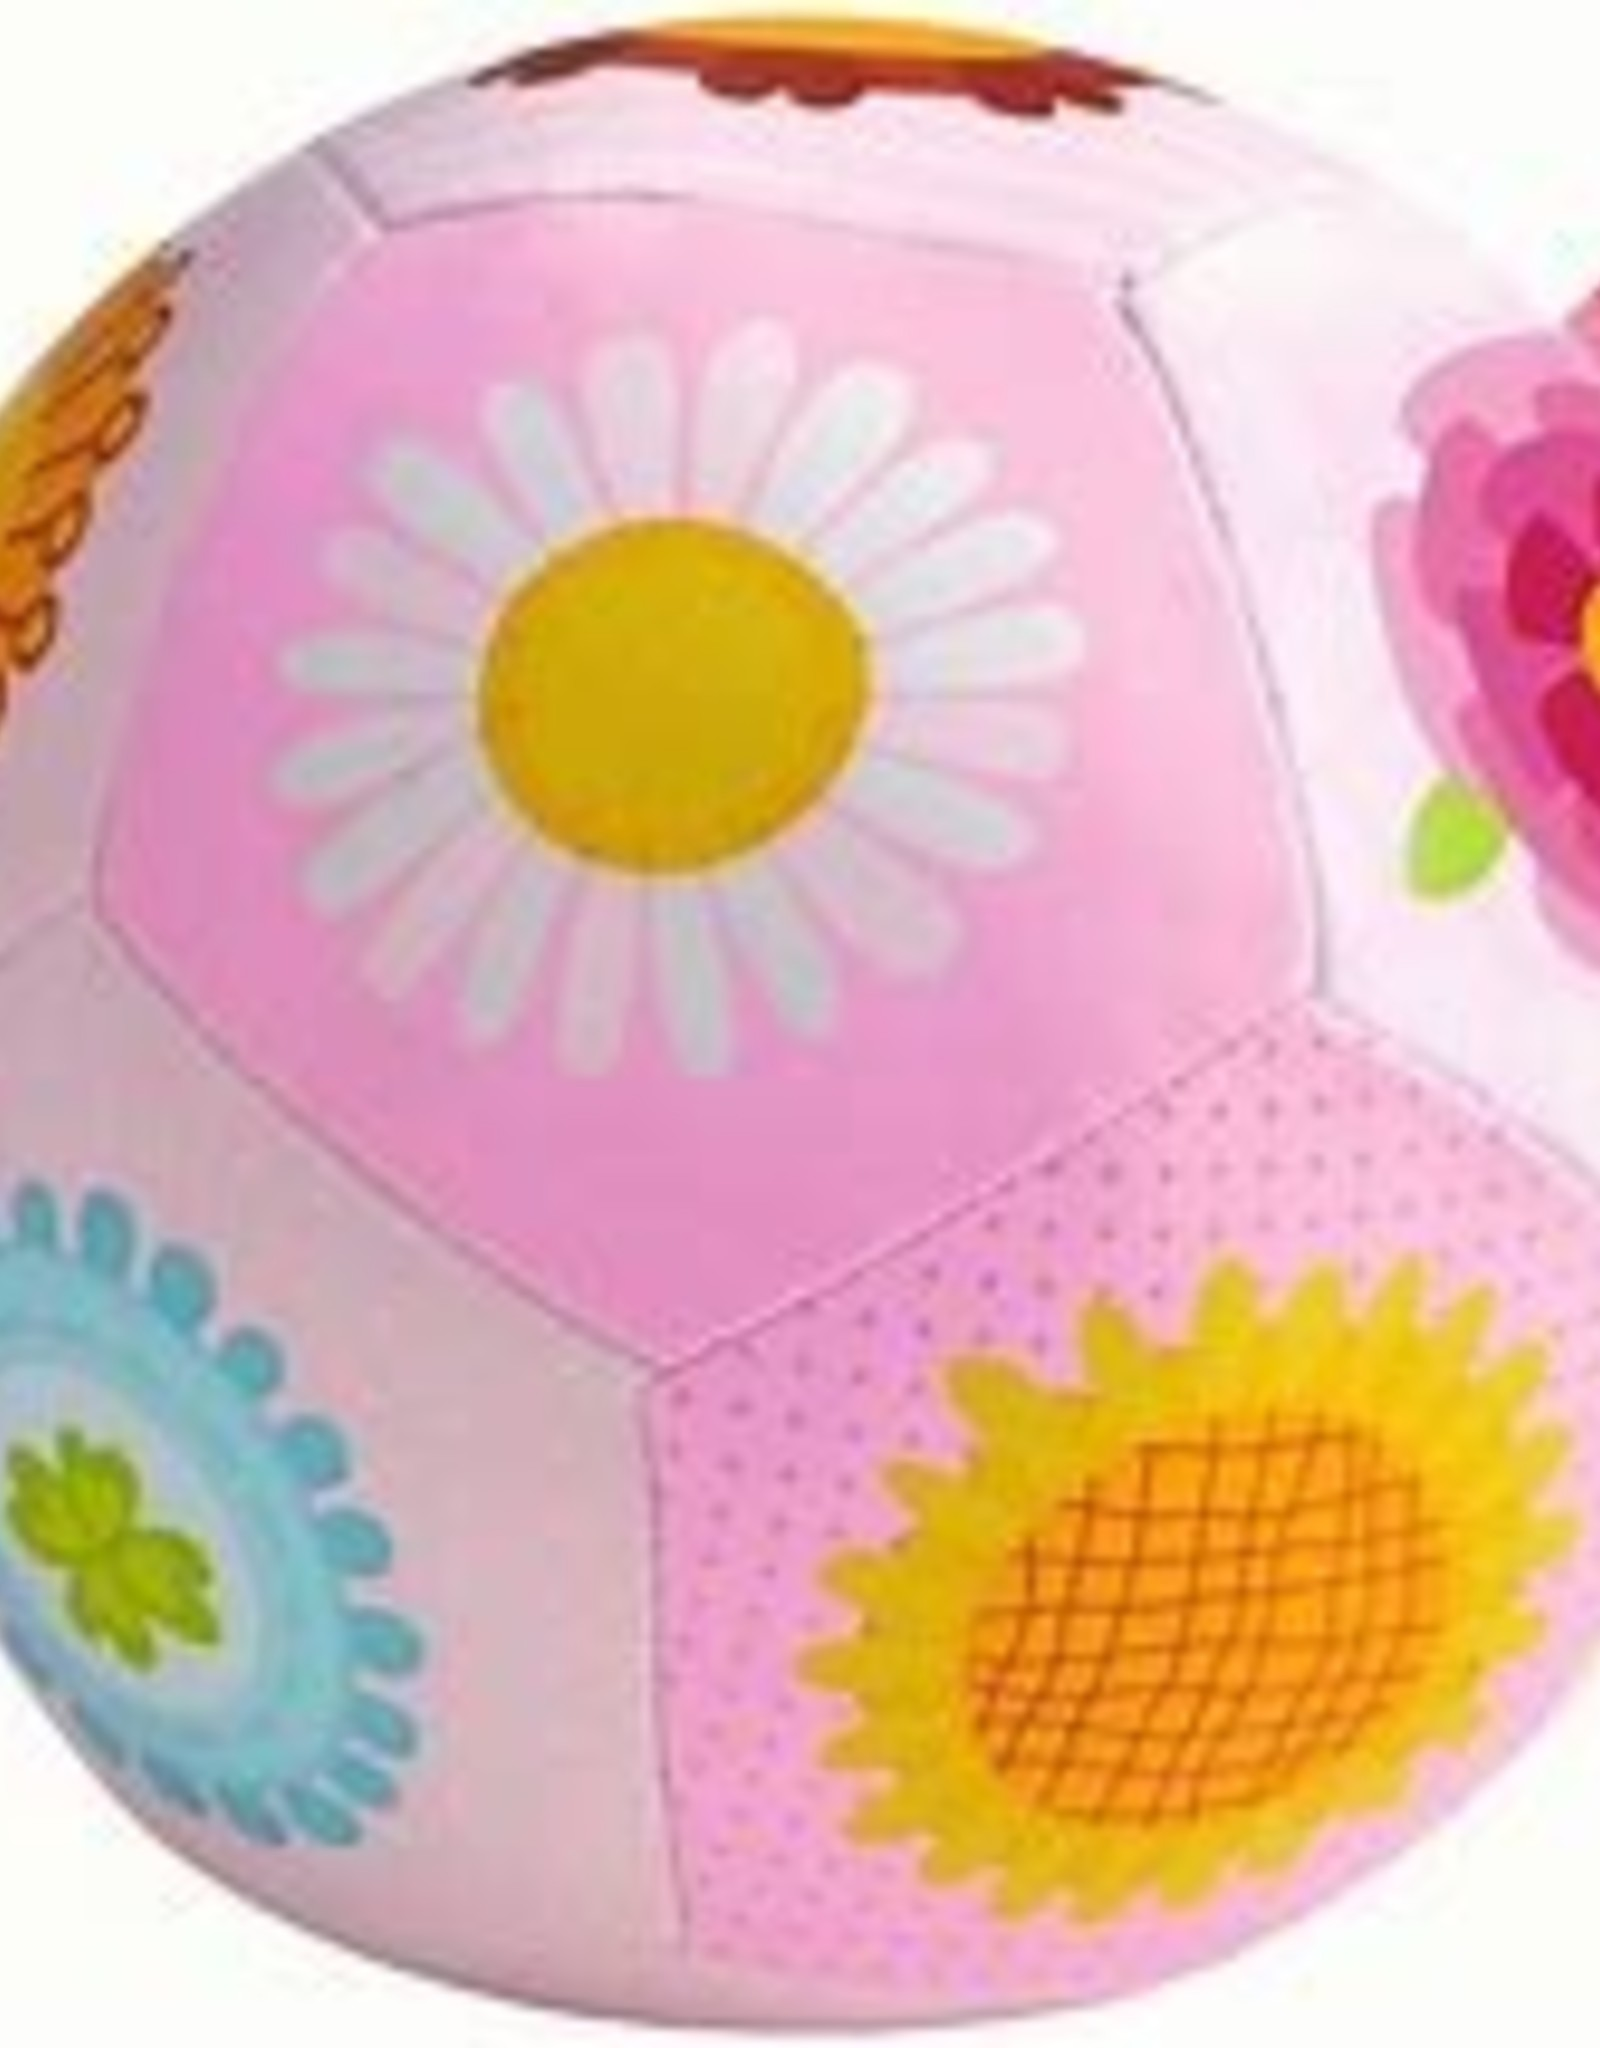 Haba Baby Ball Flower Magic, 5 1/2